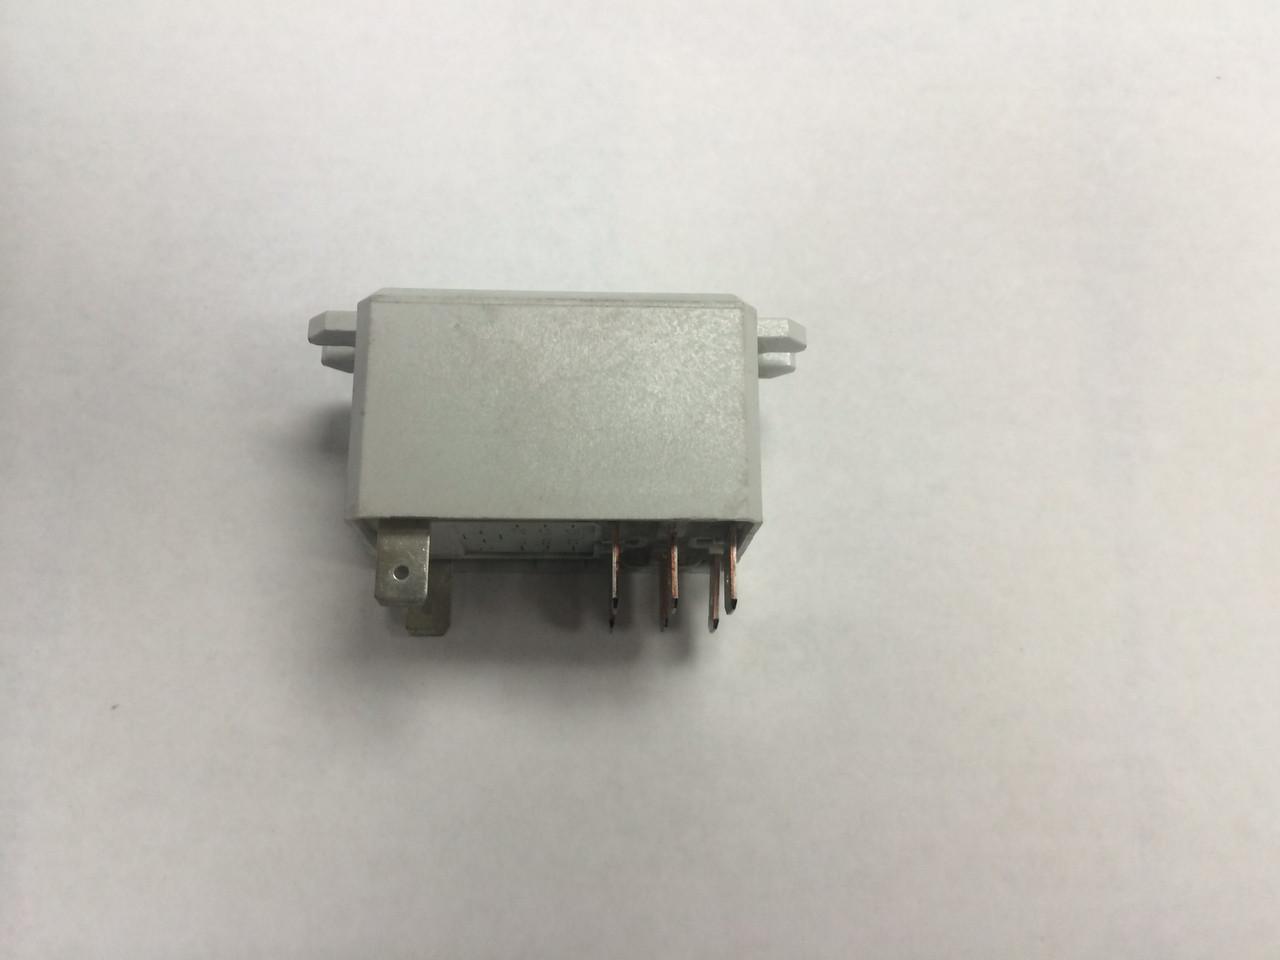 TorRey M-22R2 & M-22RW2 - 208/220 Volt Relay - 05-01454